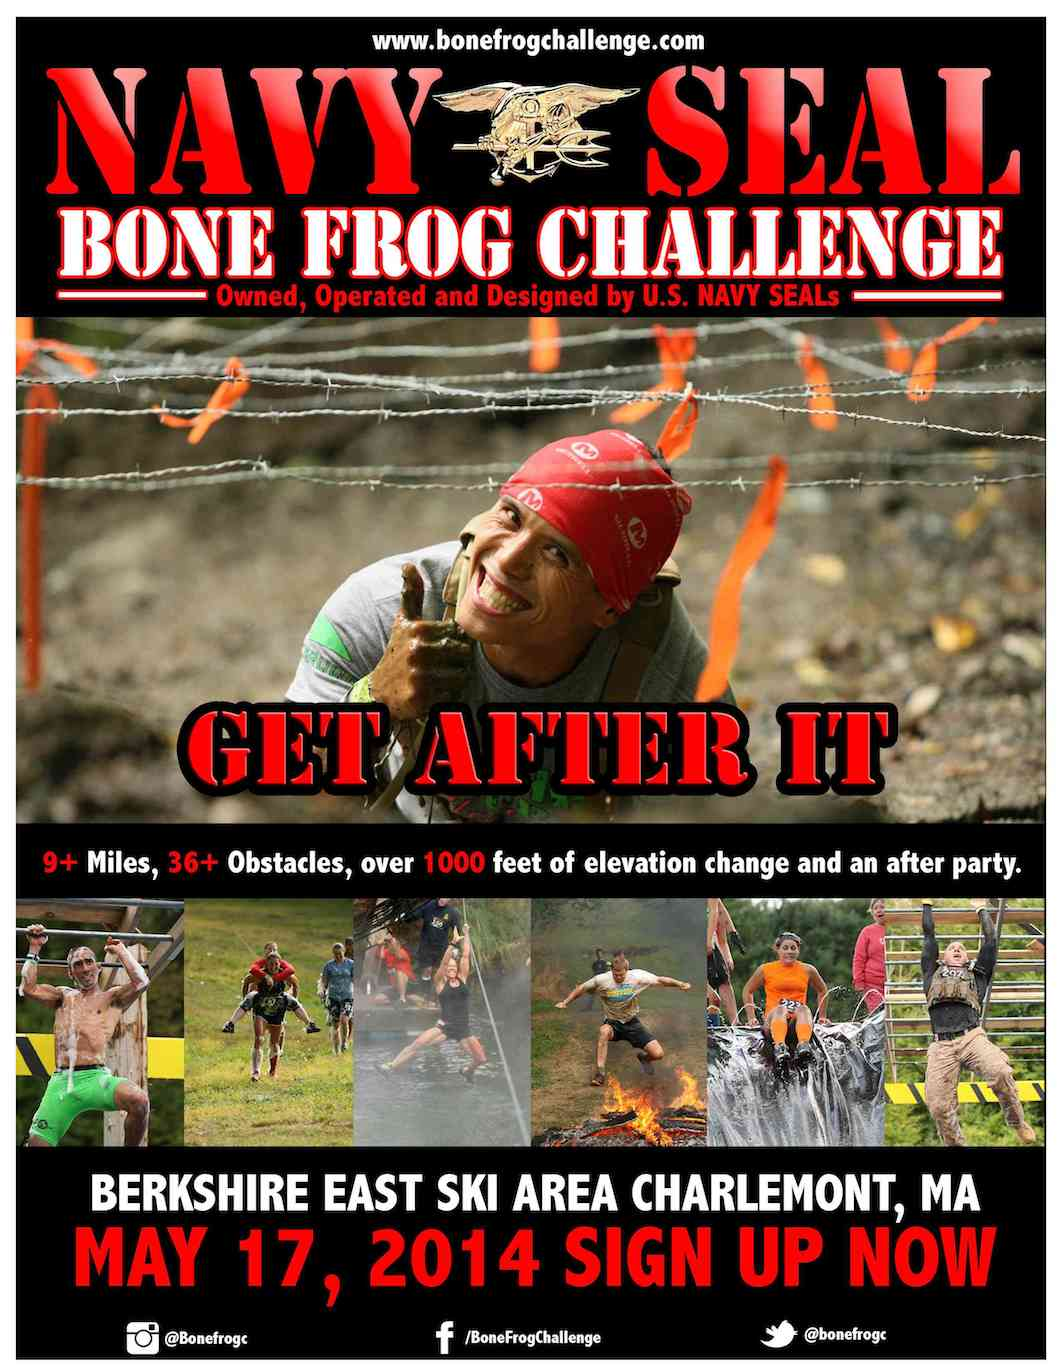 Bone Frog Challenge flyer